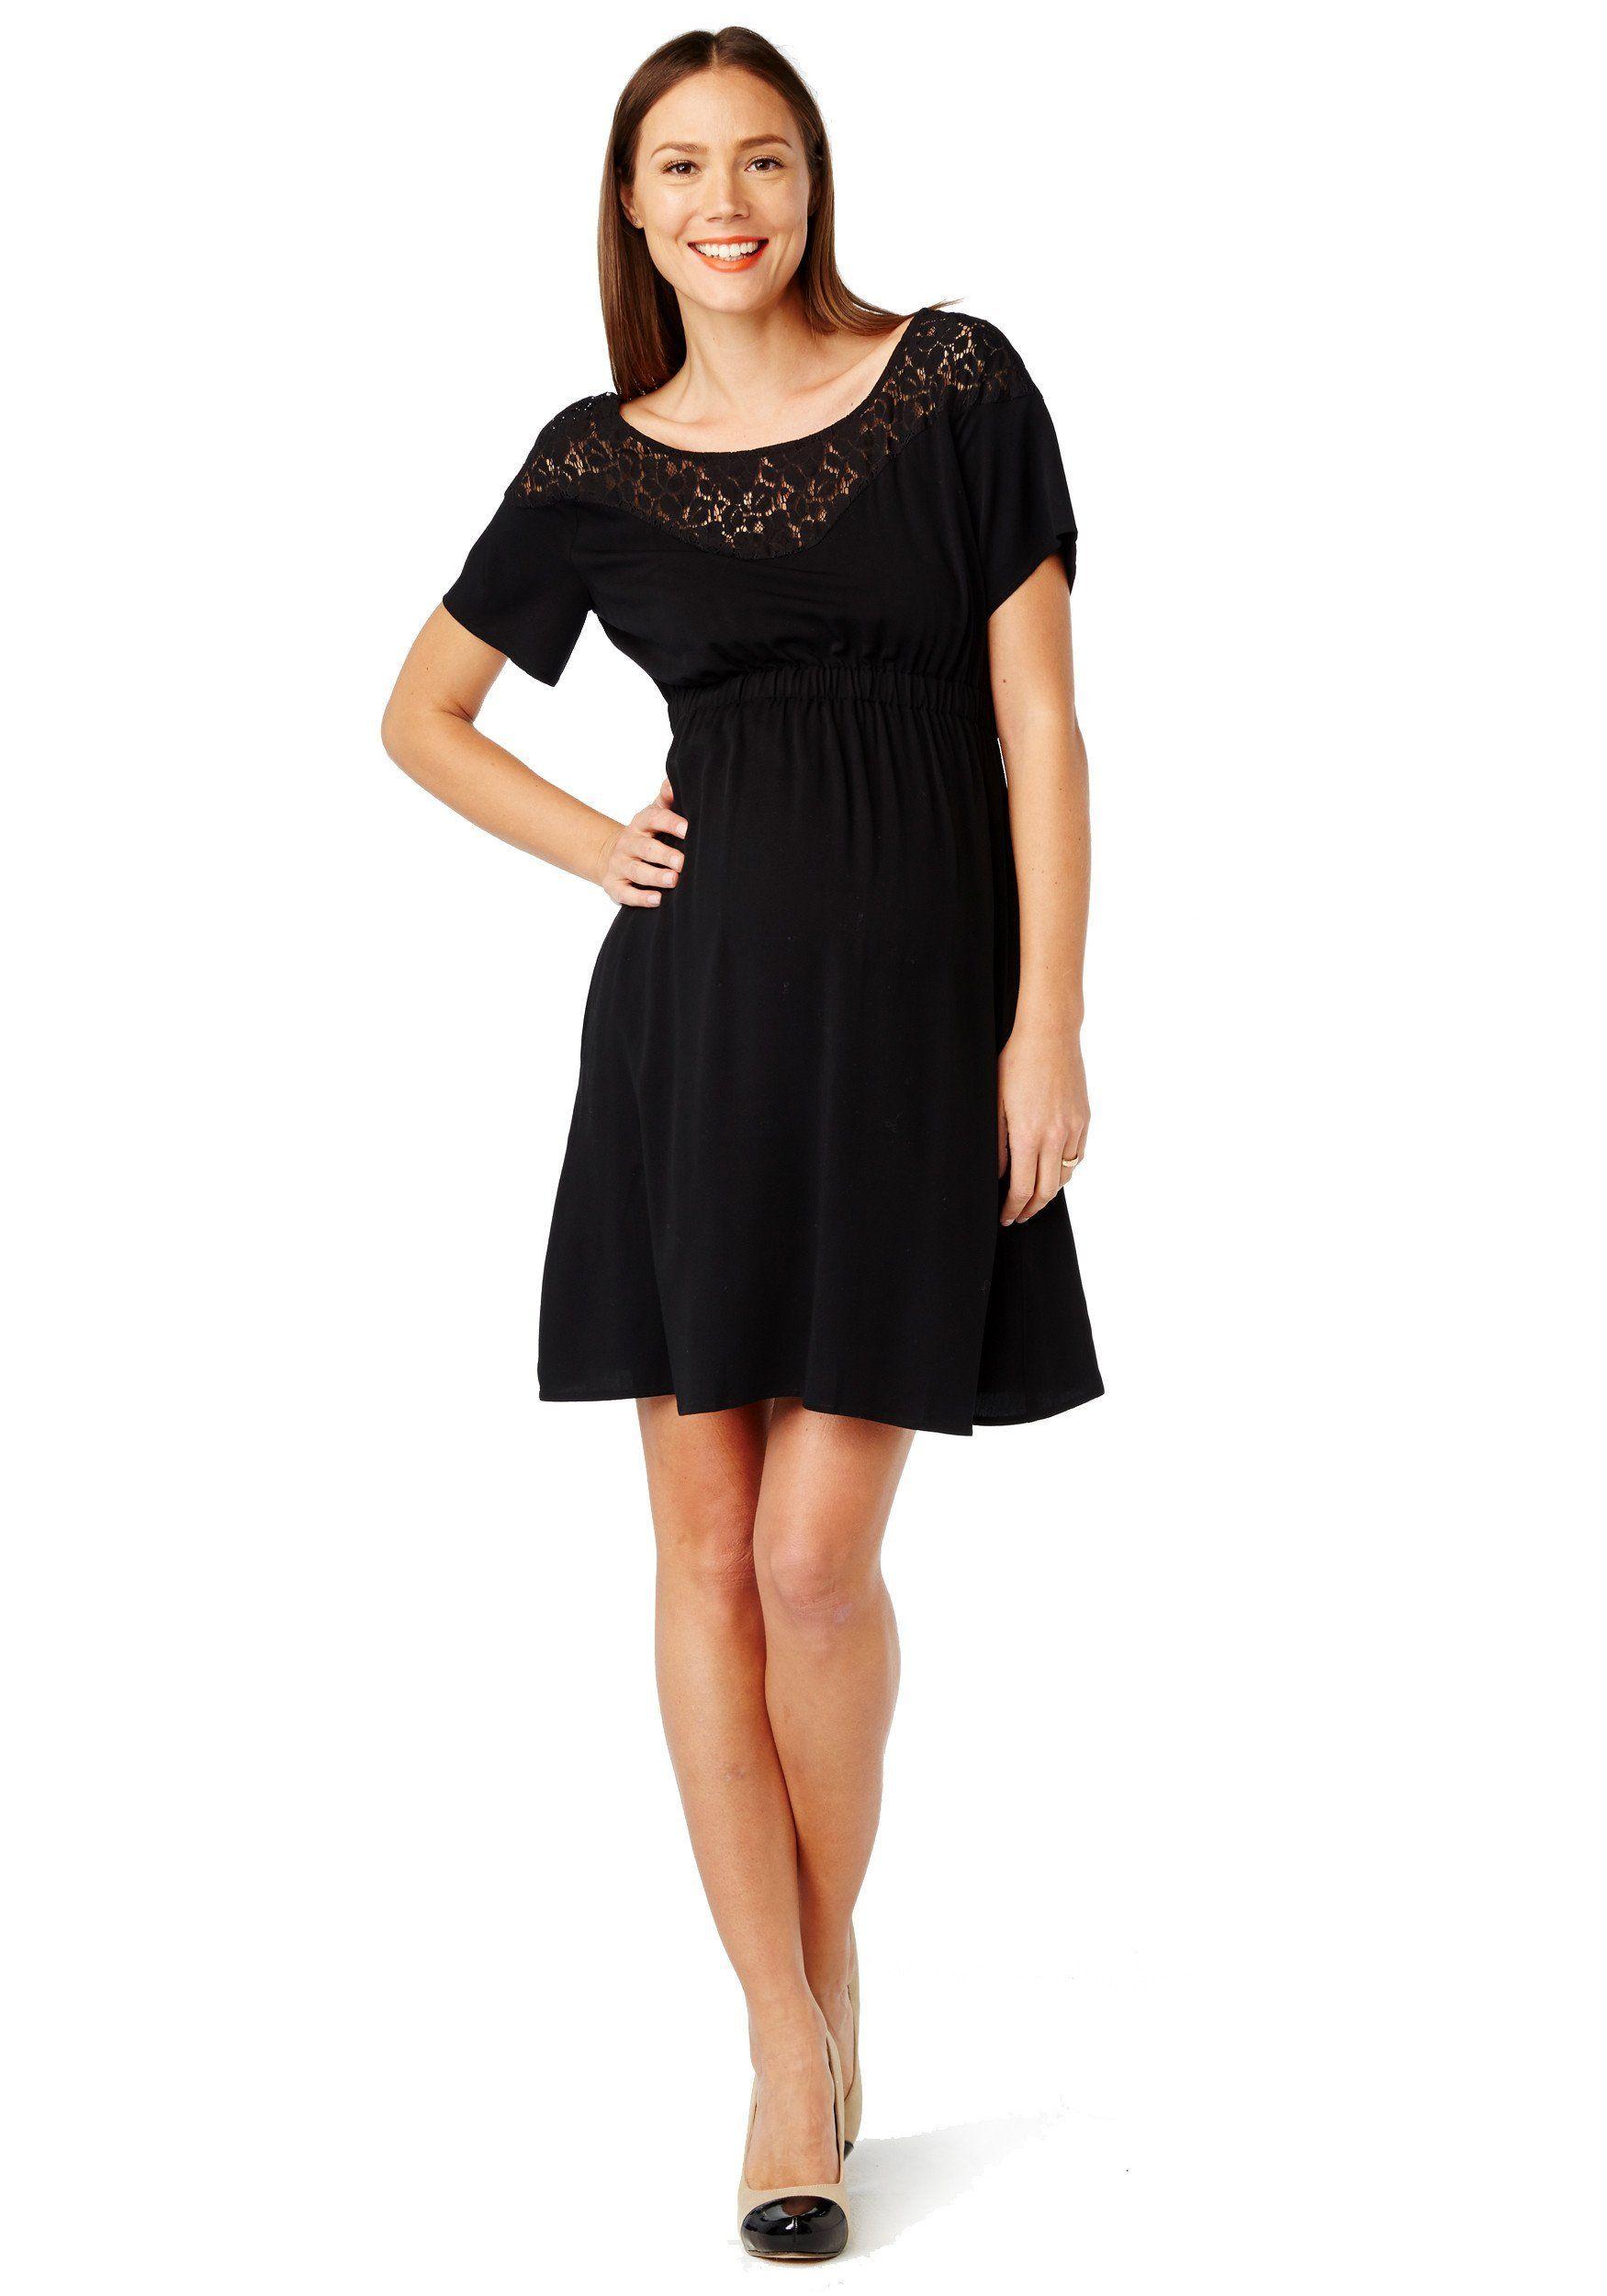 Rosie Pope Maternity Charlotte Dress : All Maternity Wear Dresses